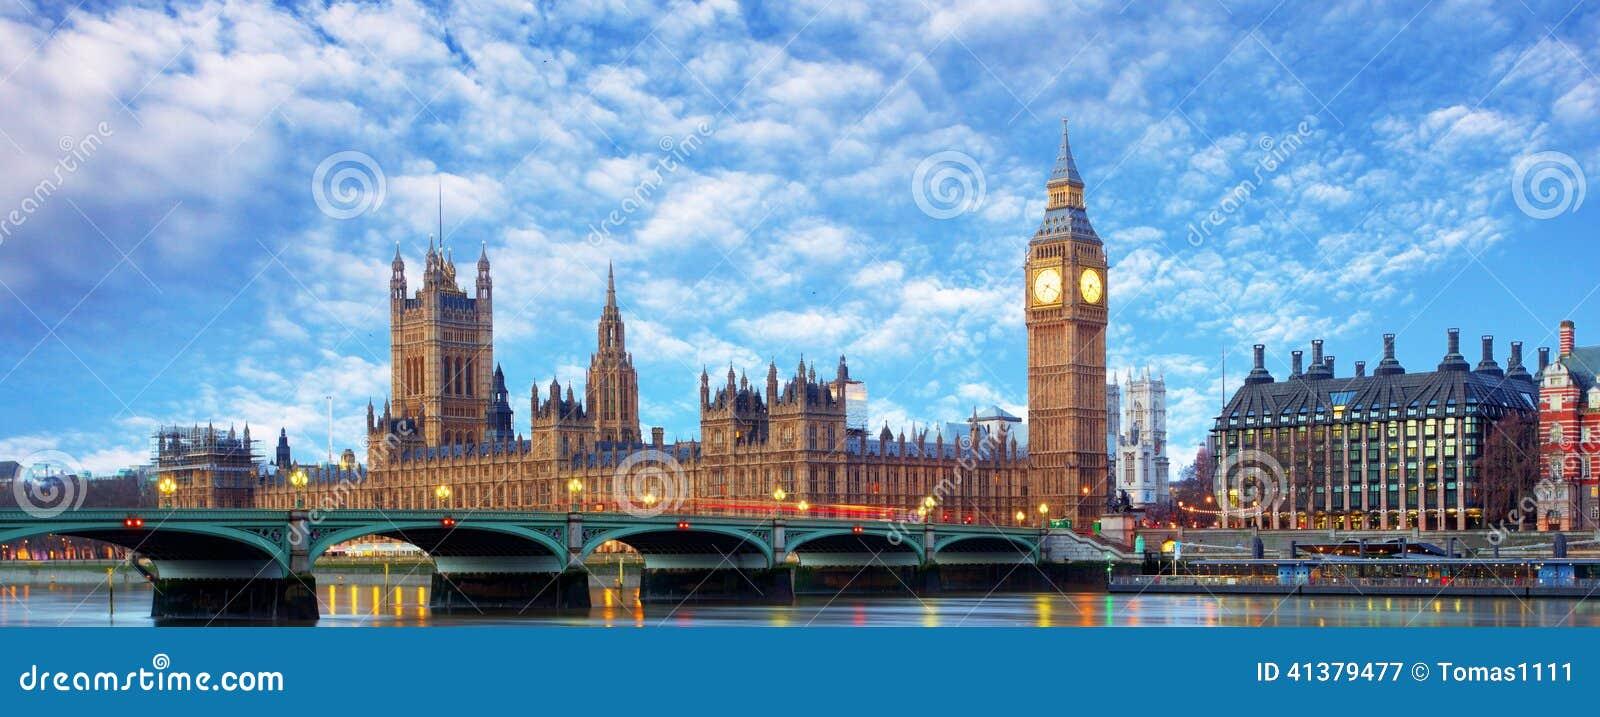 London panorama - Big ben, UK